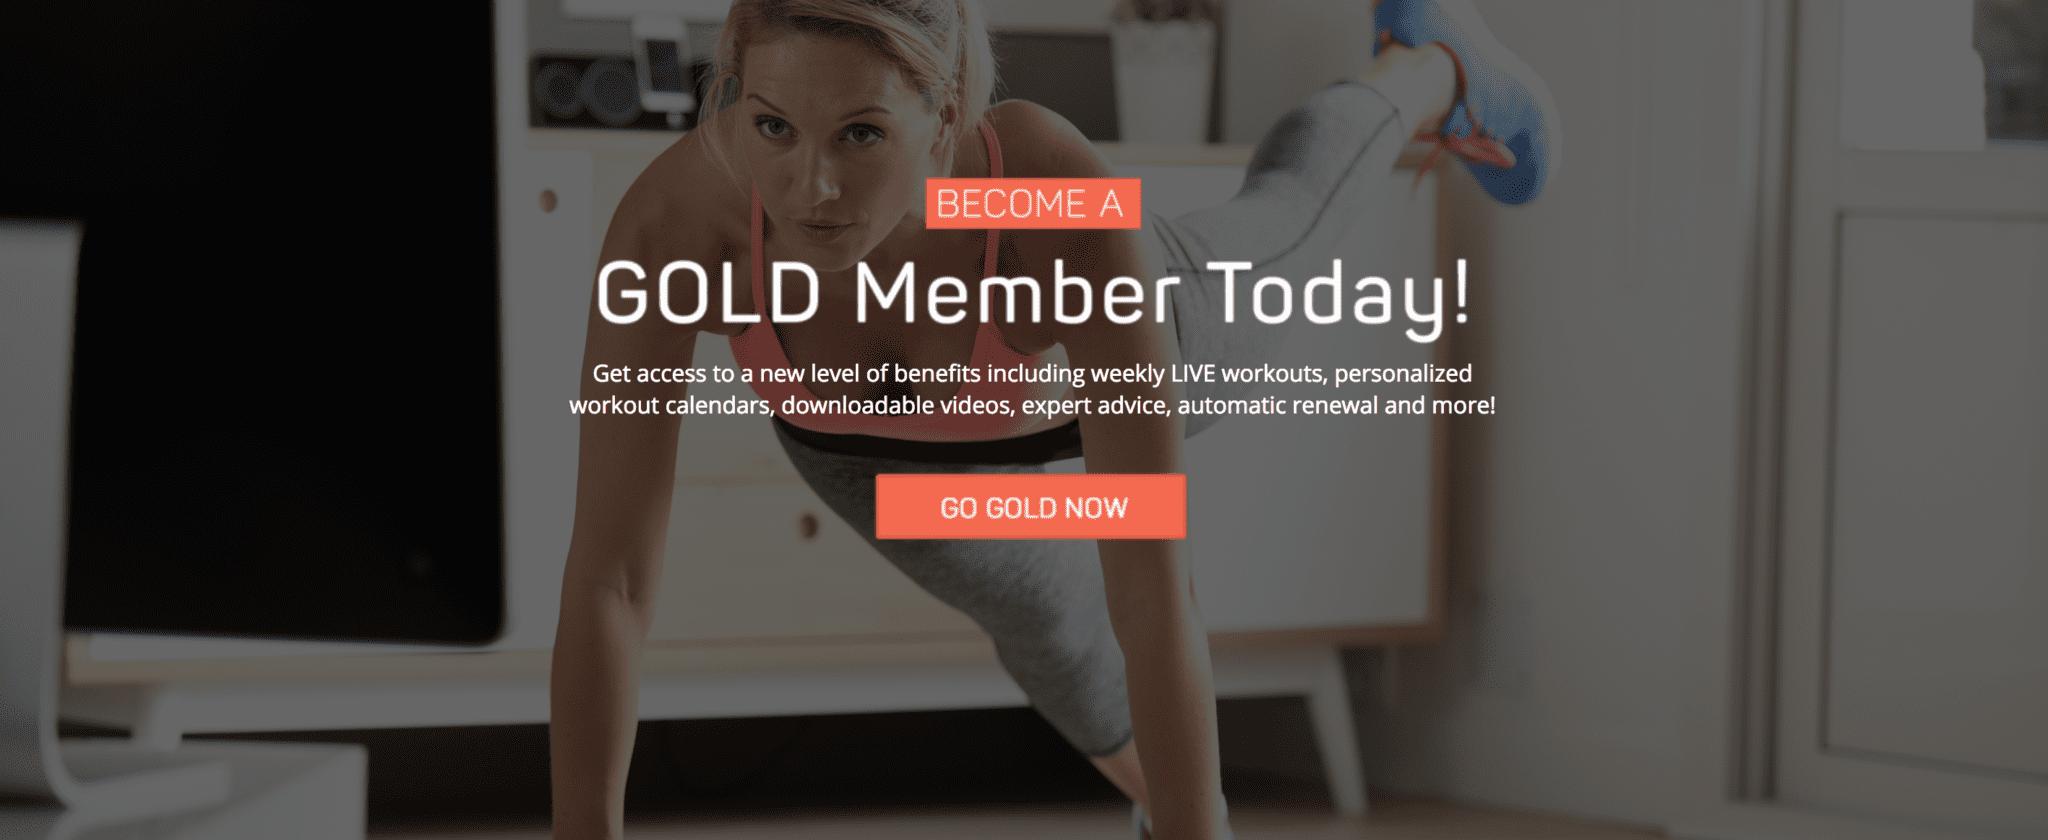 Get Healthy U TV Gold Member